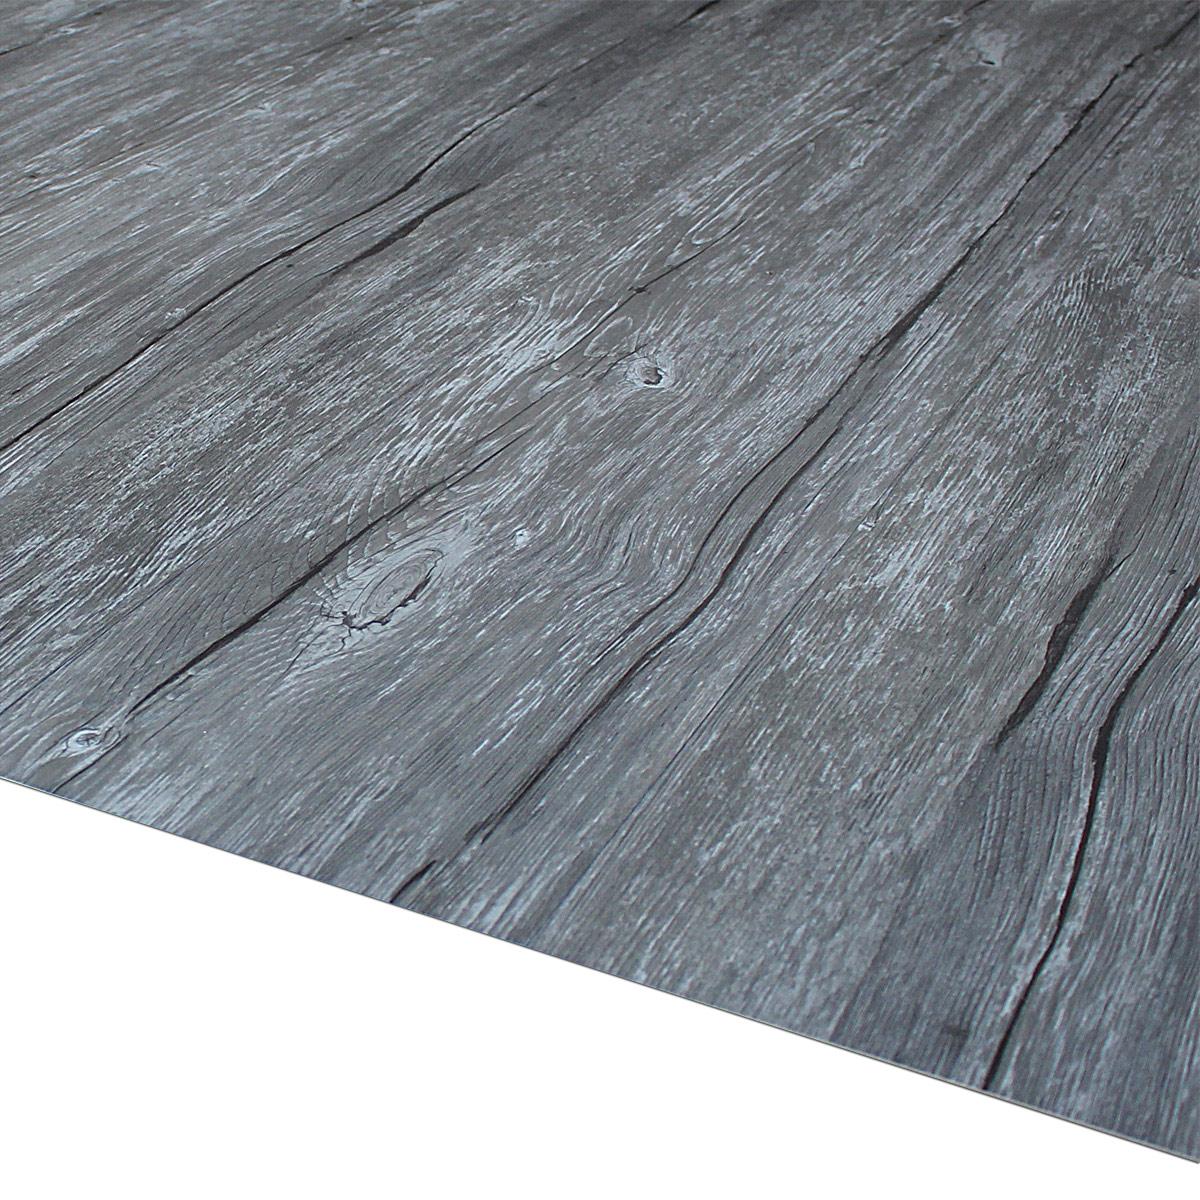 Neu Holz 20 08m Vinyl Laminatlen Planken Eiche White